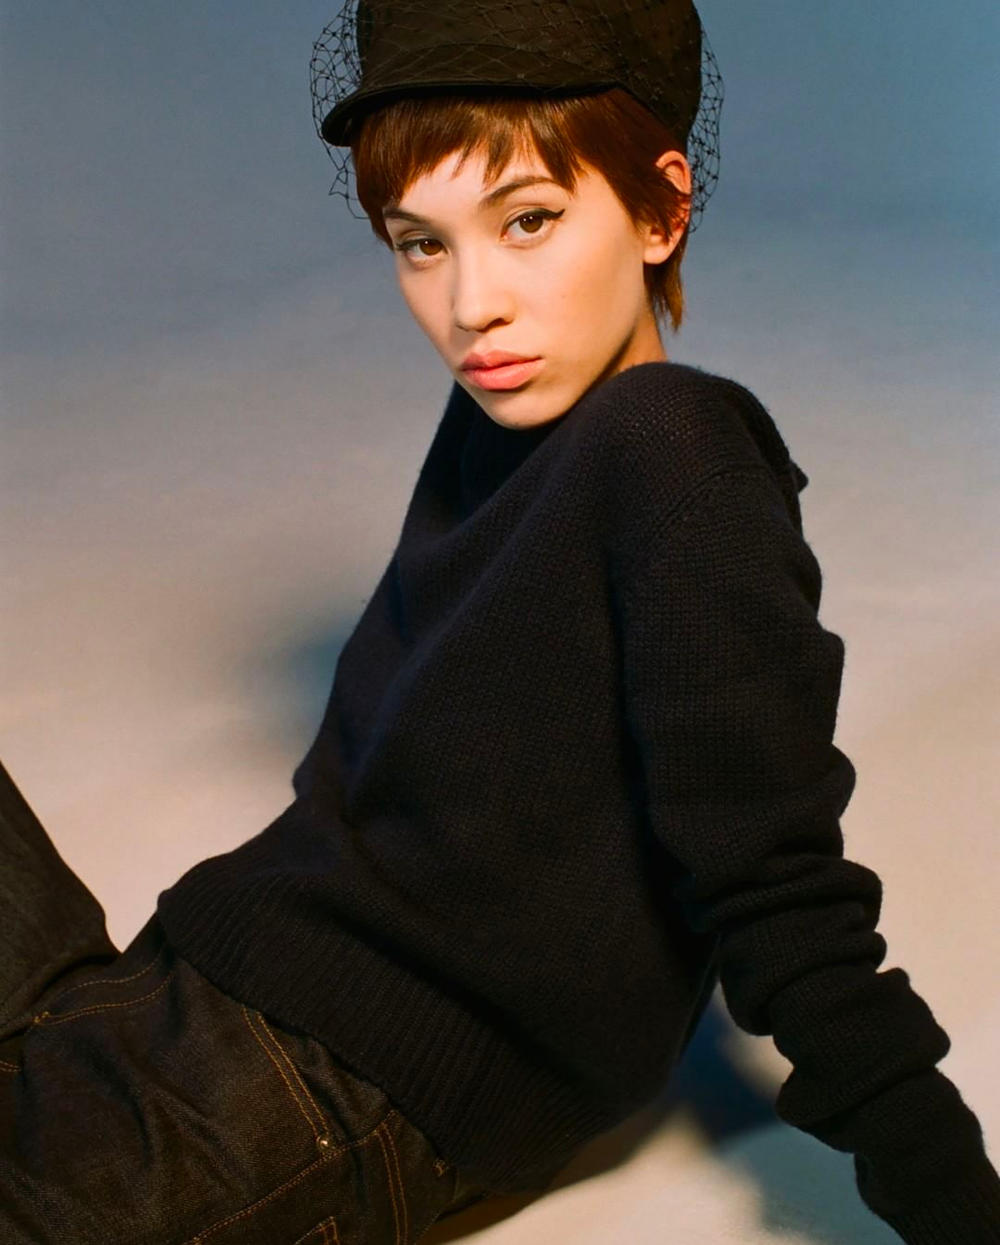 Kiko Mizuhara Christian Dior Tokyo Exclusive Campaign Beret Hat